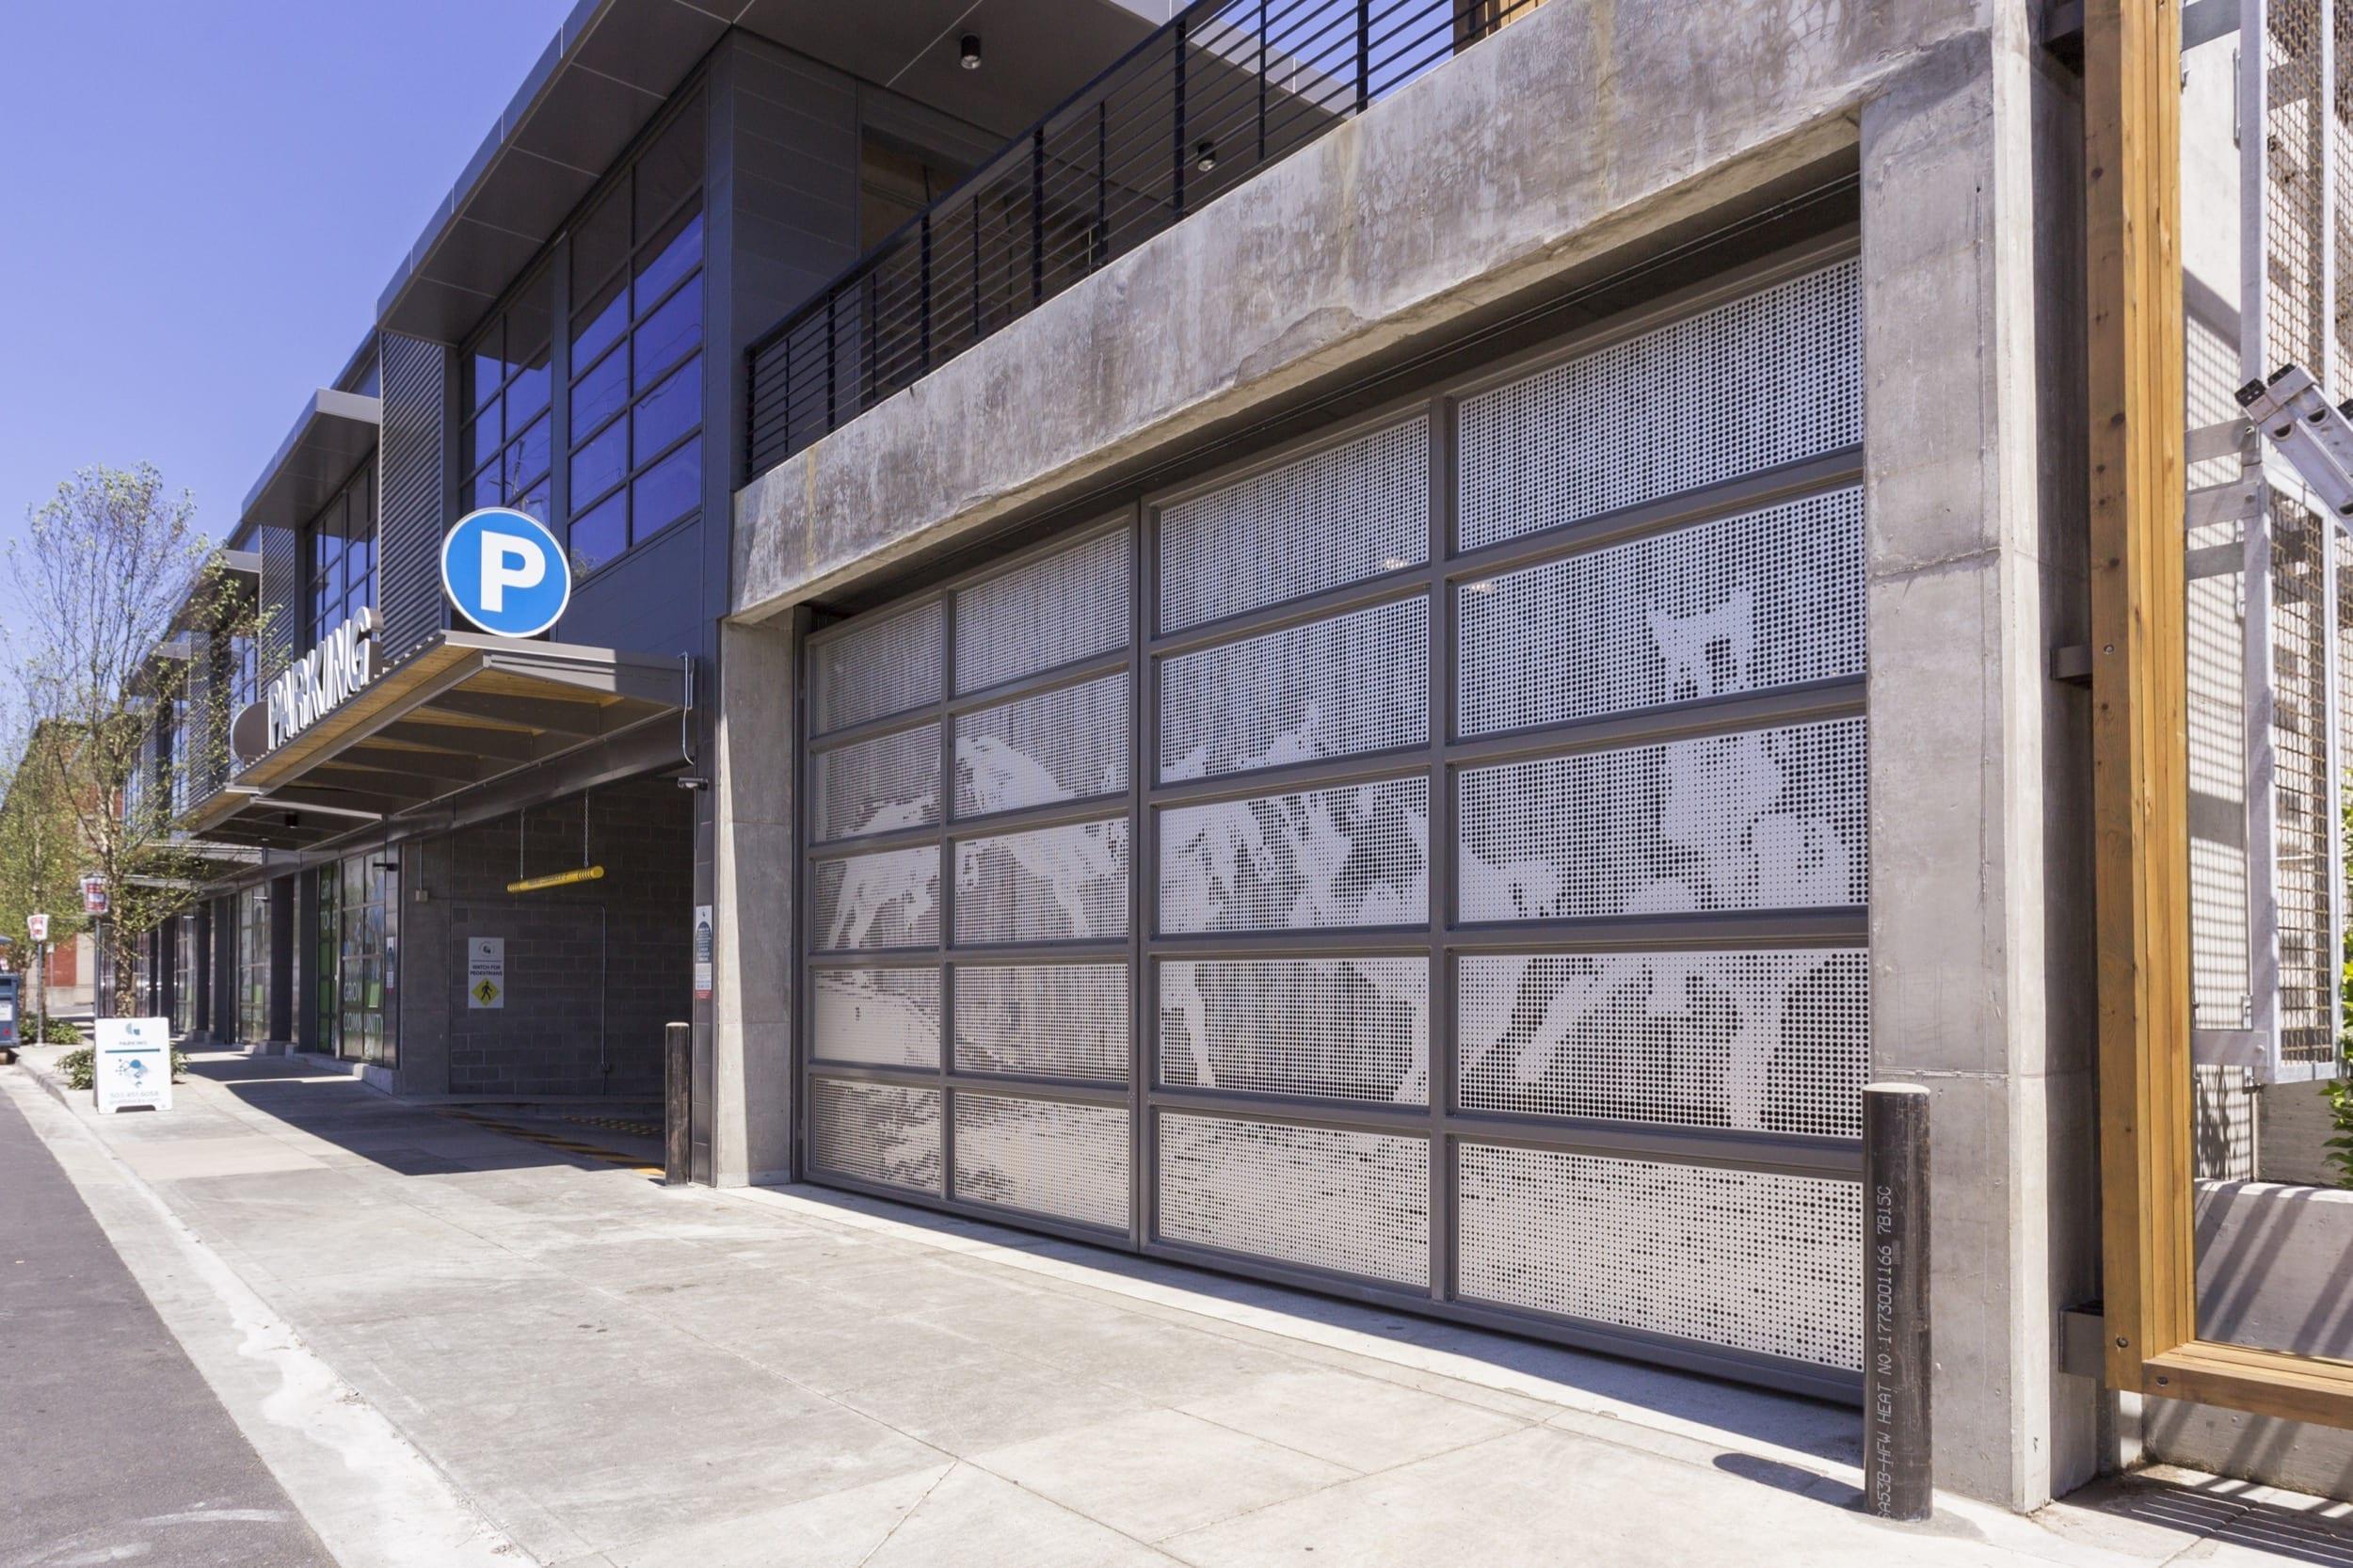 Exterior view of ImageWall applied to hinged garage door.